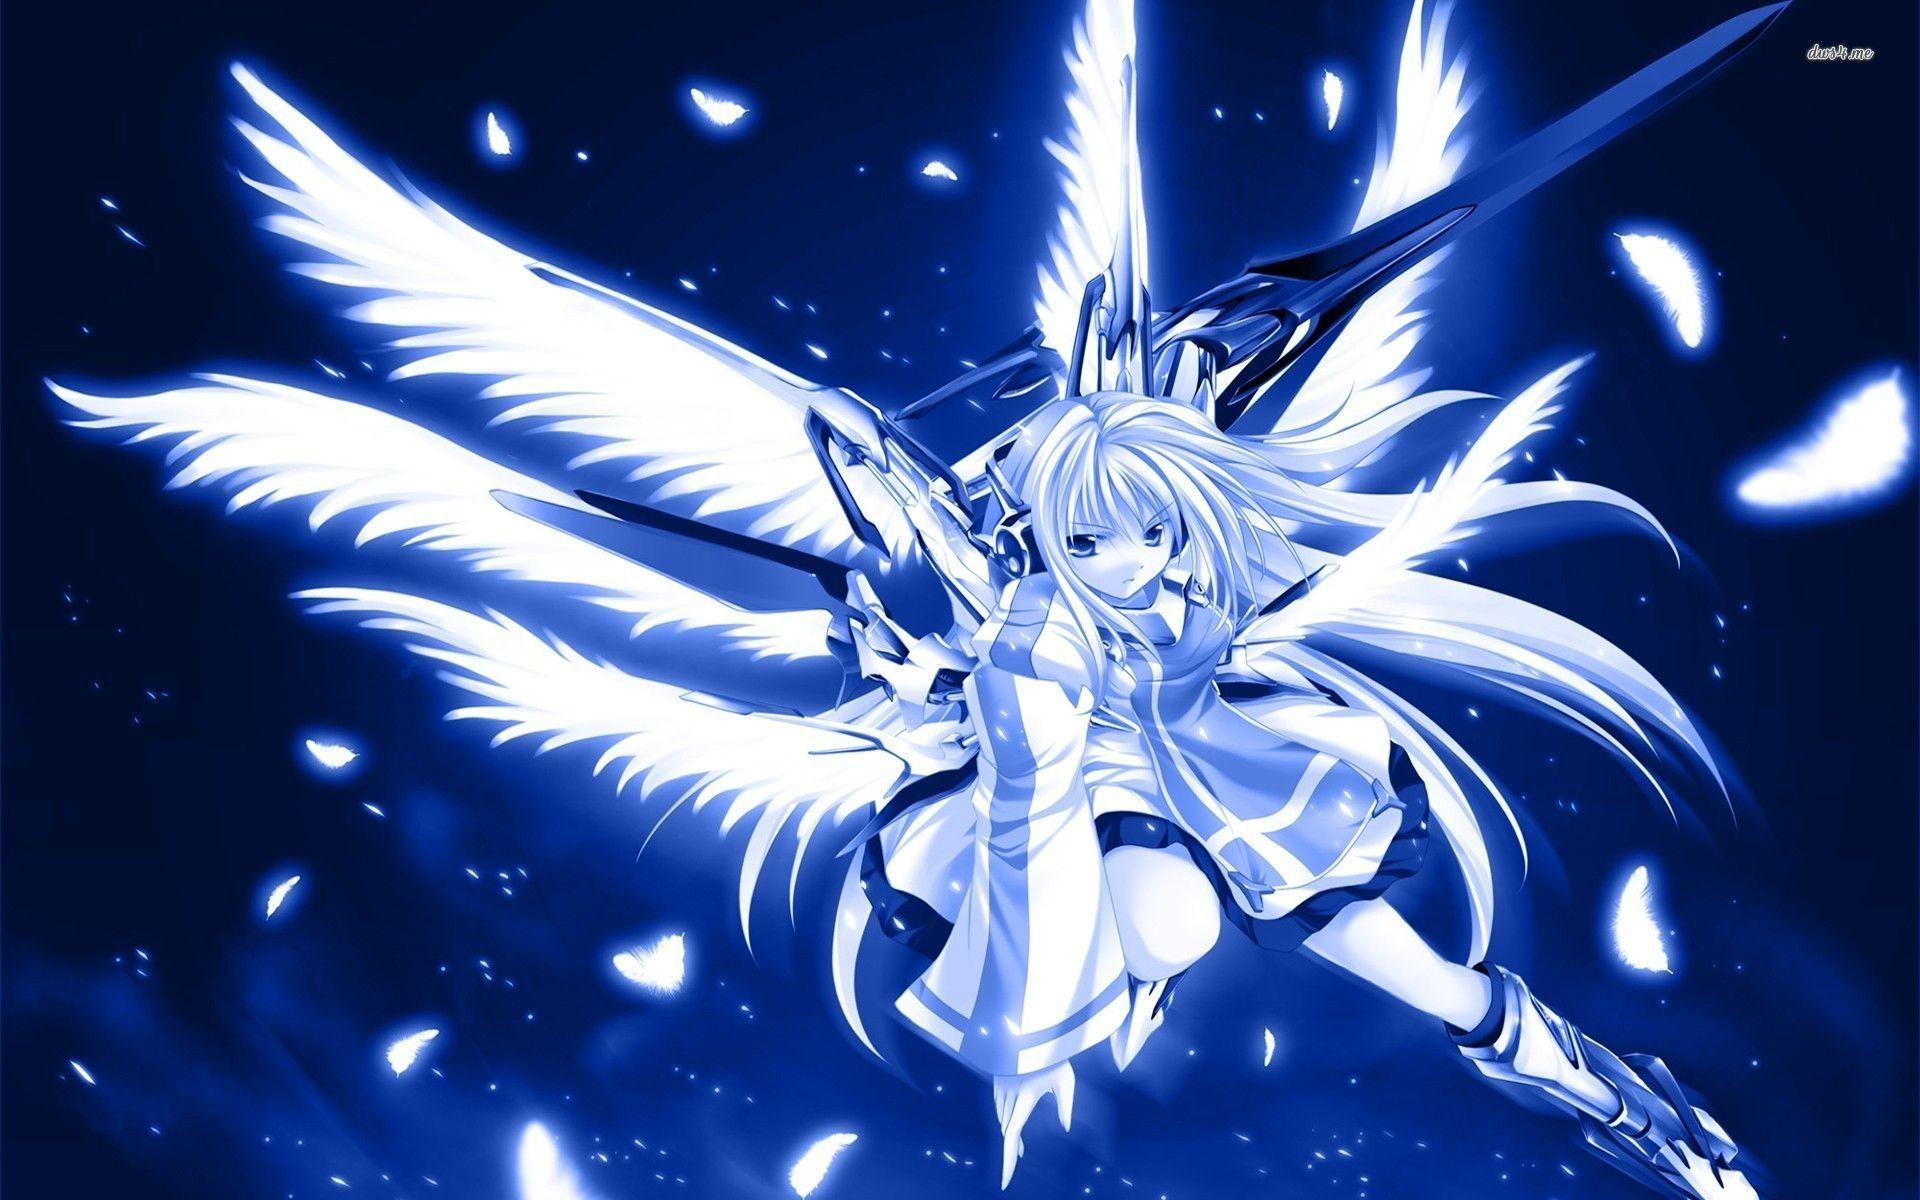 Blue warrior angel wallpaper – Anime wallpapers – #19305